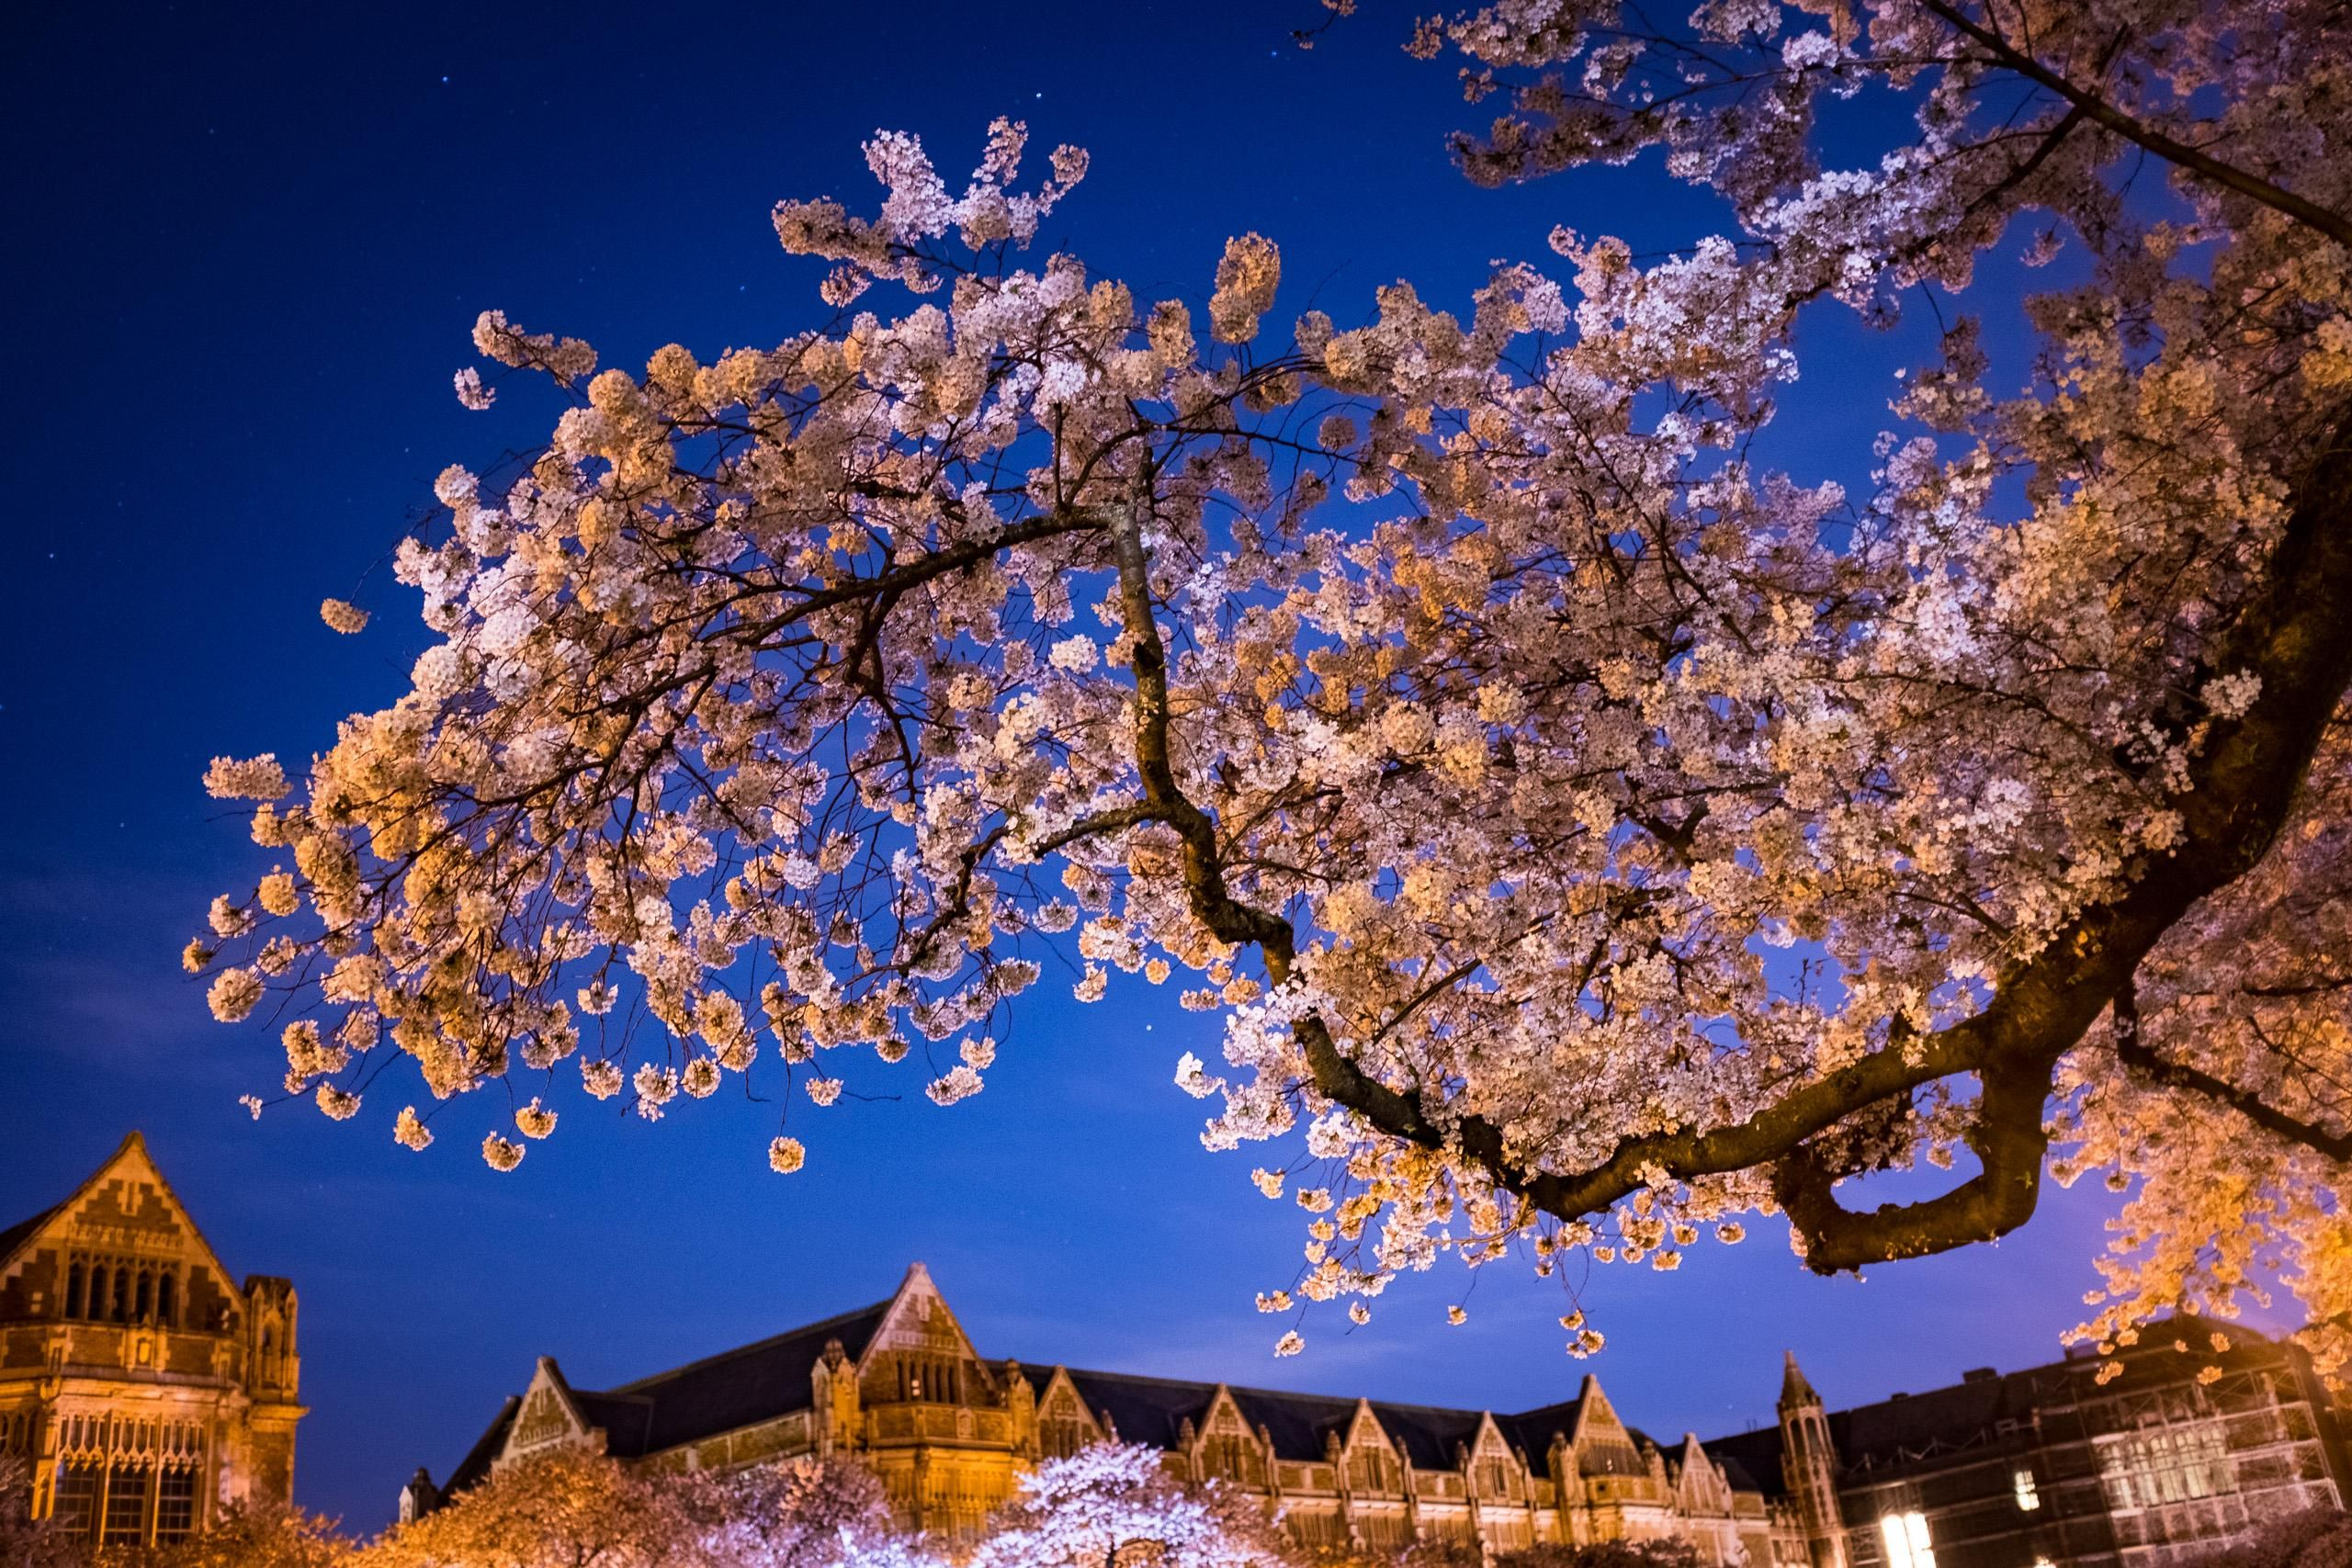 Last Night In Nakameguro Tokyo Aesthetic Japan Japan Tourism Japan Travel